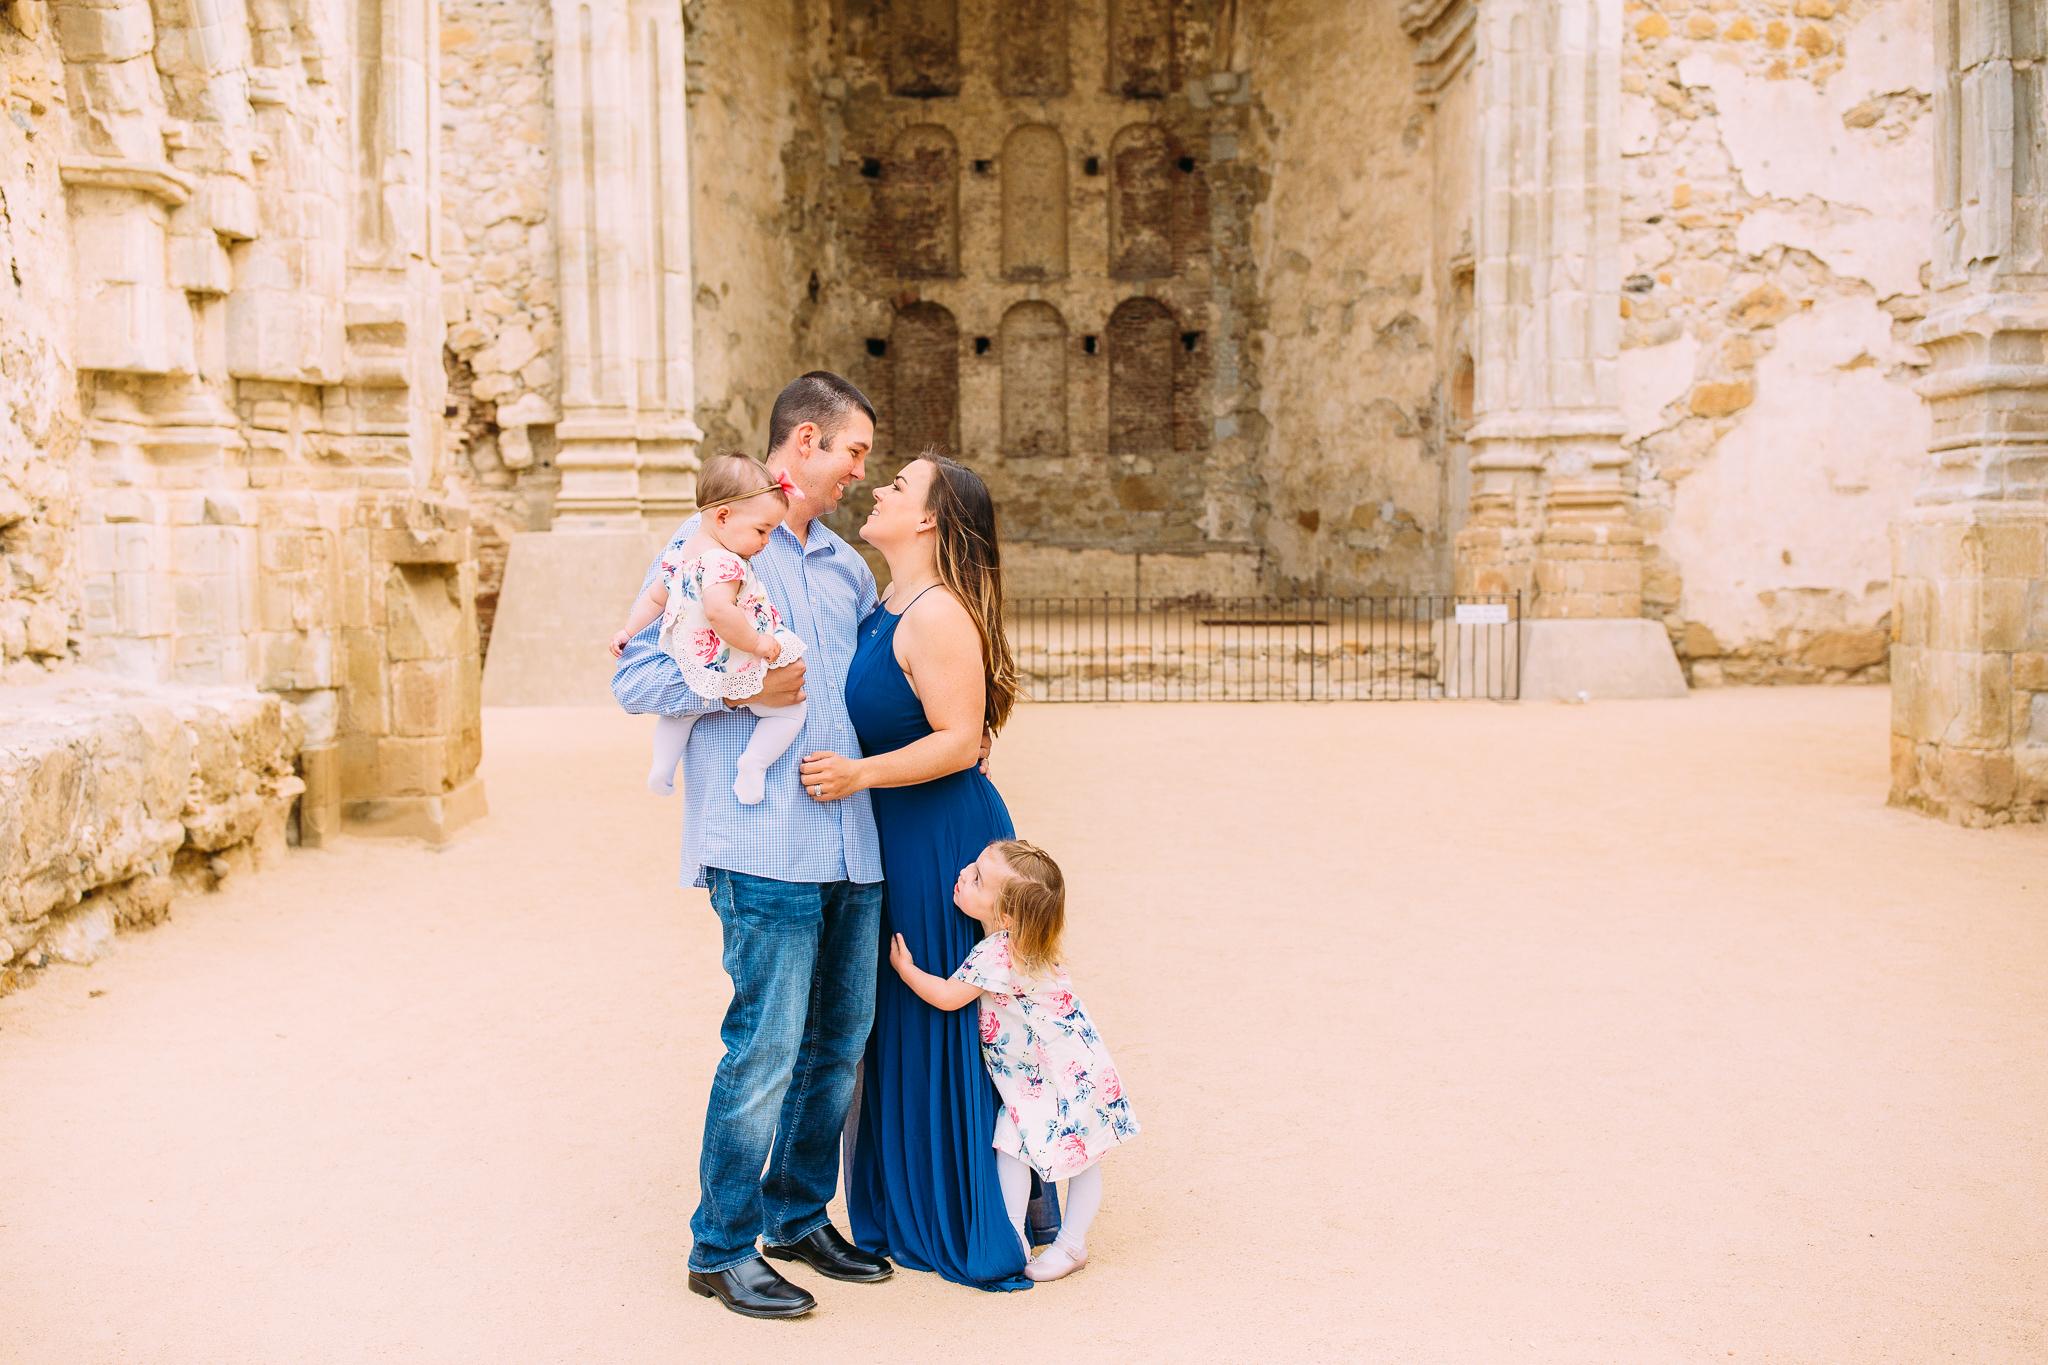 orangecountyfamilyphotographer24.jpg